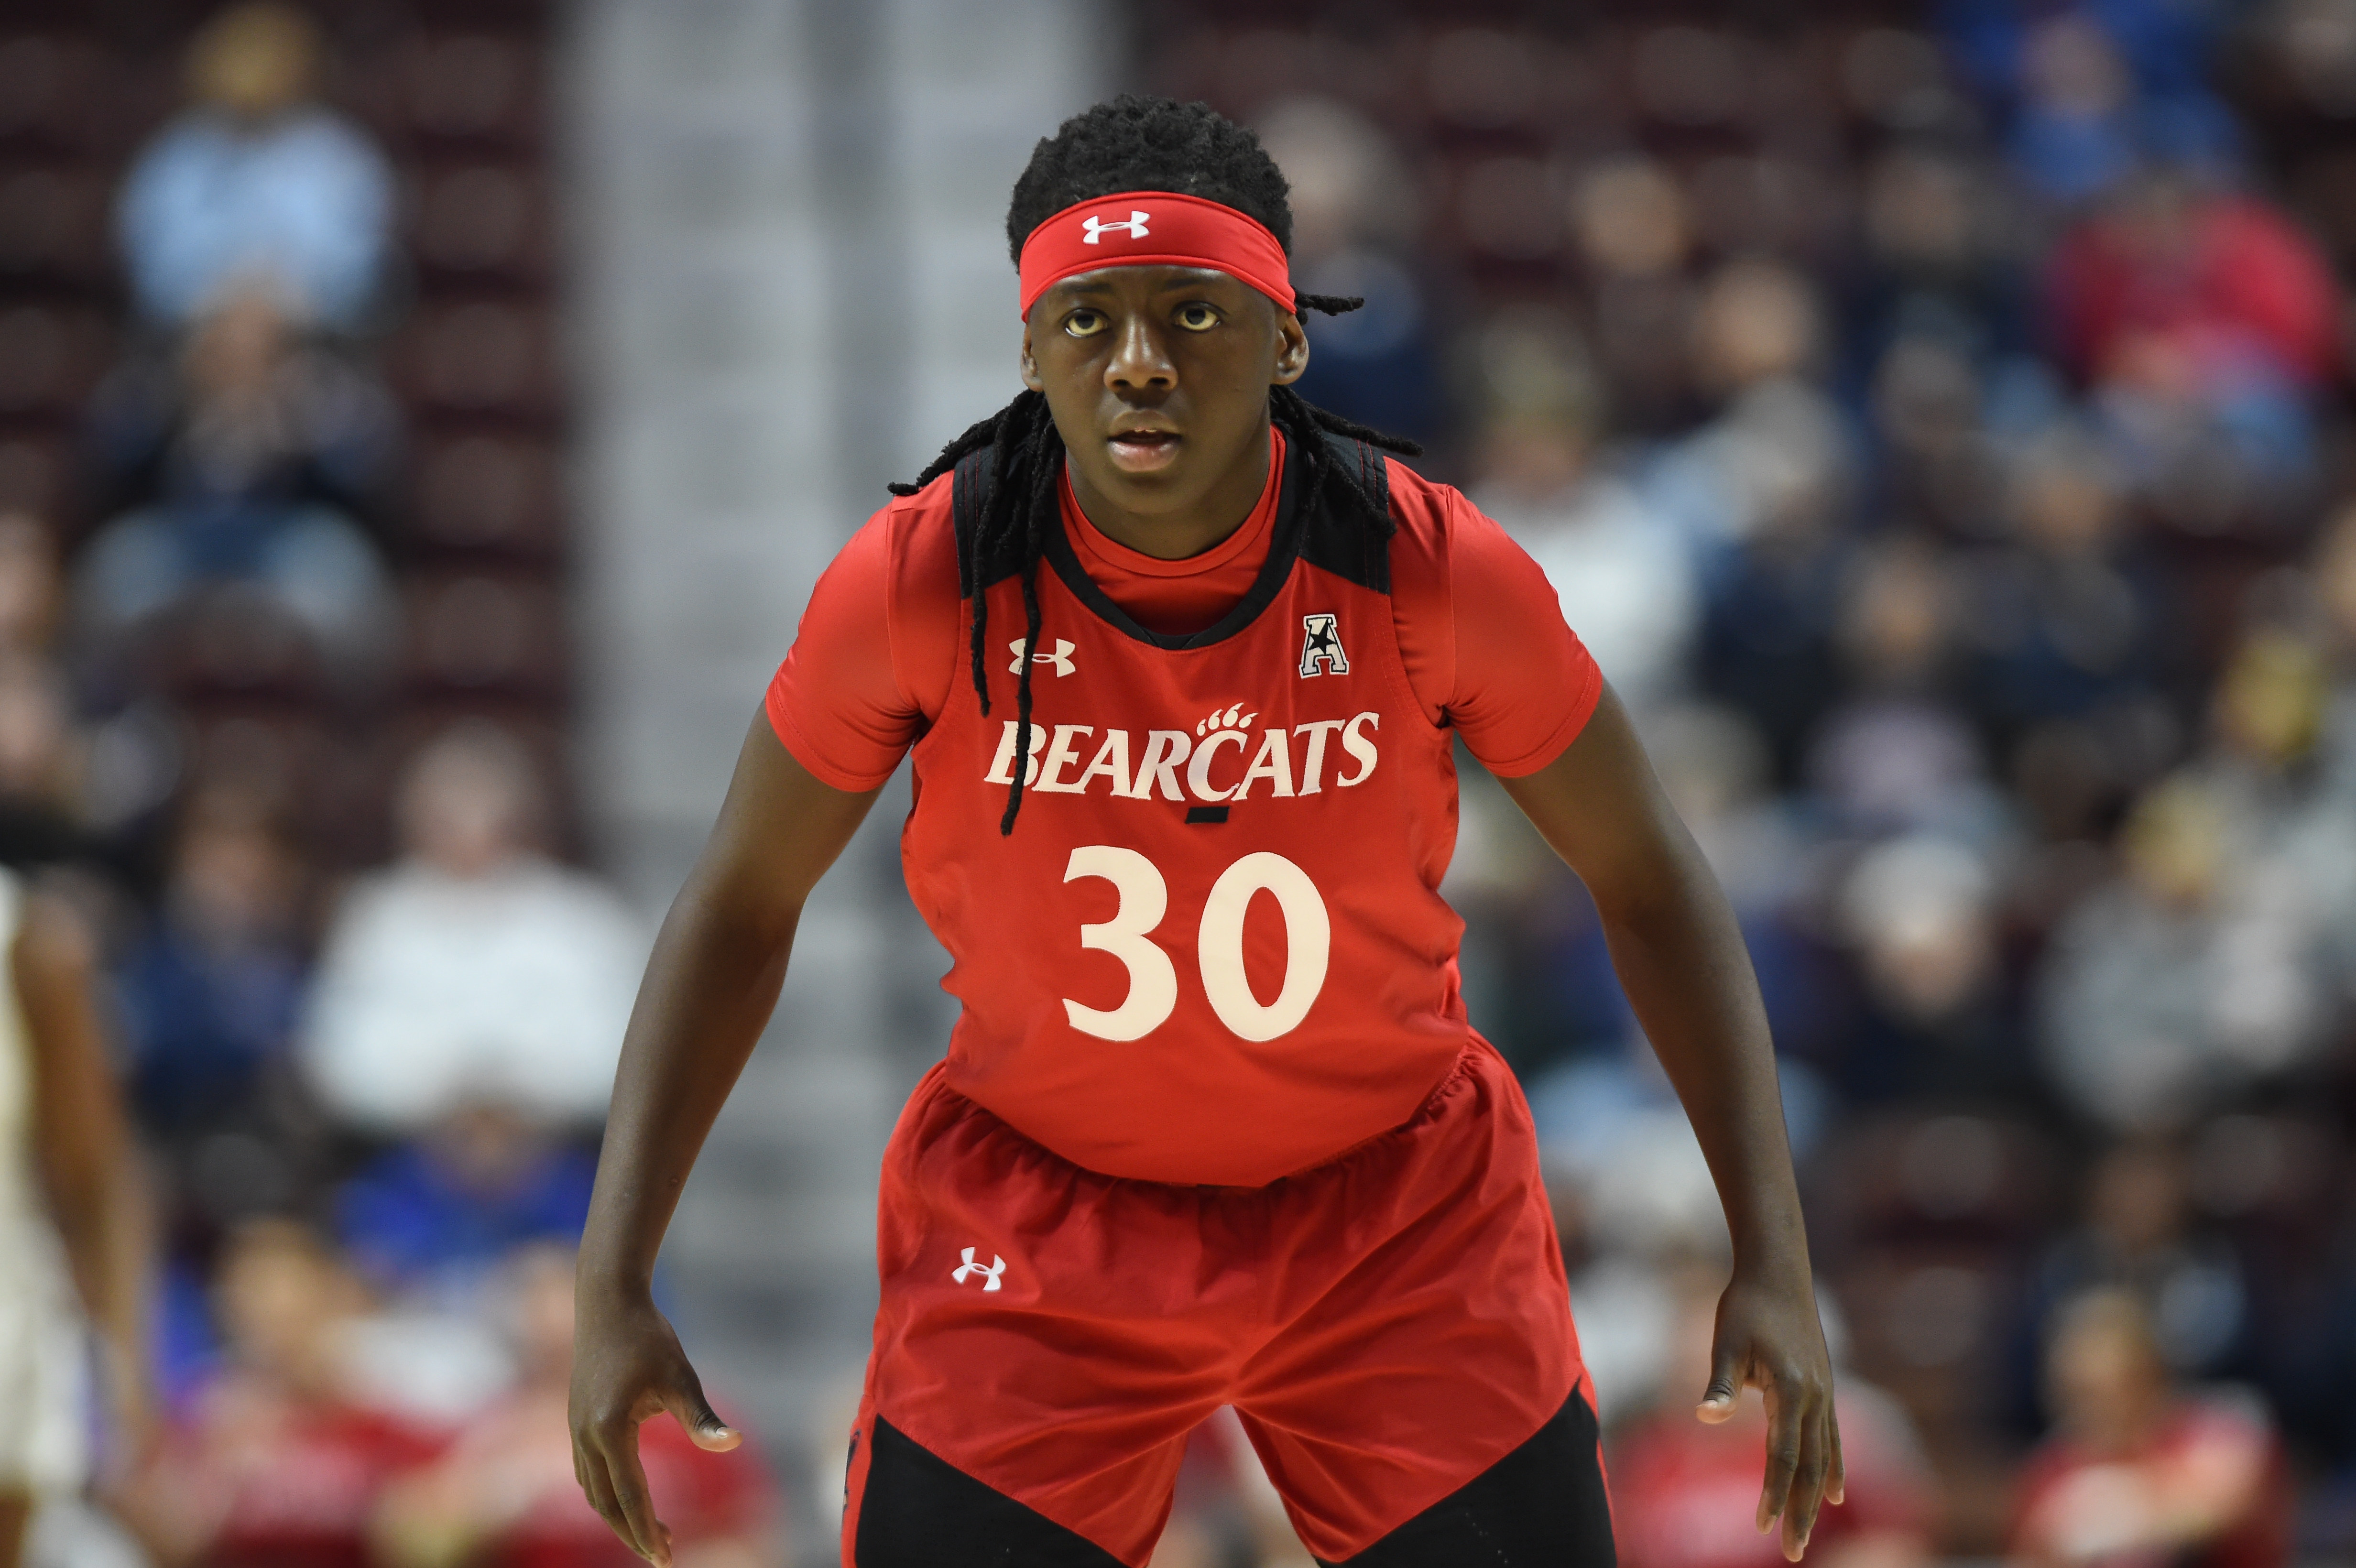 COLLEGE BASKETBALL: MAR 10 American Athletic Conference Women's Championship - Cincinnati v UCF